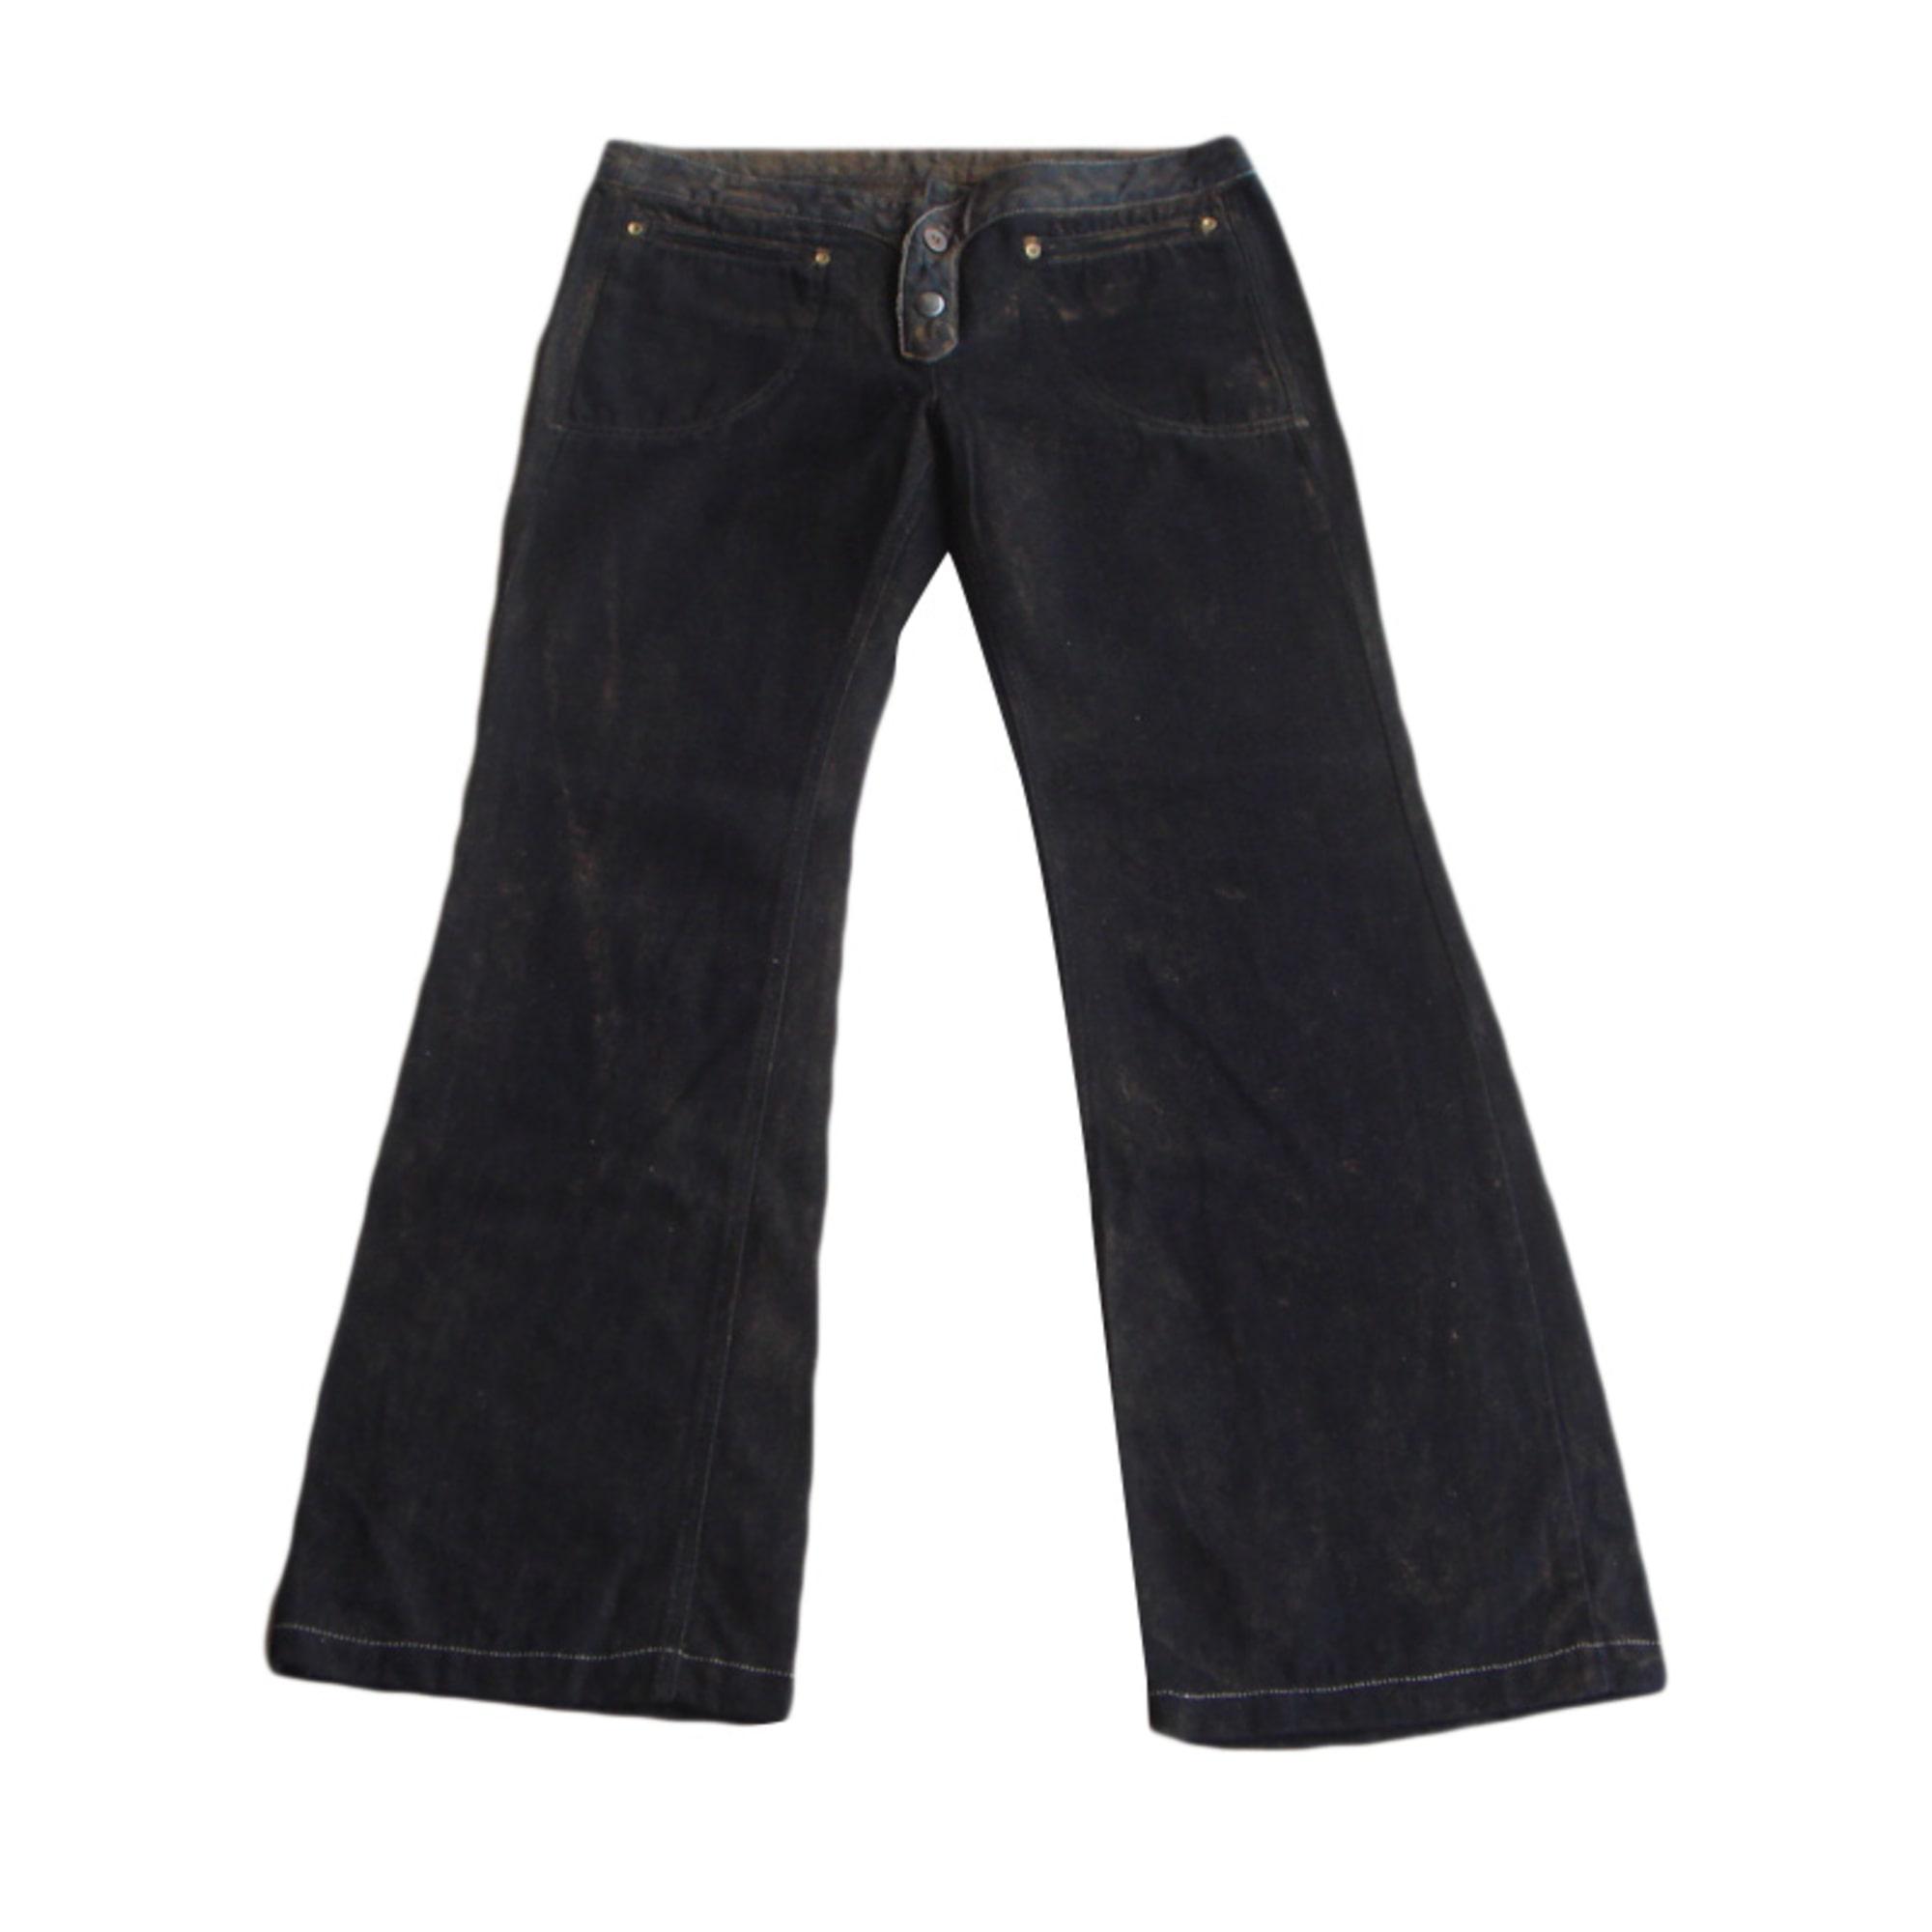 Pantalon évasé DIESEL Noir